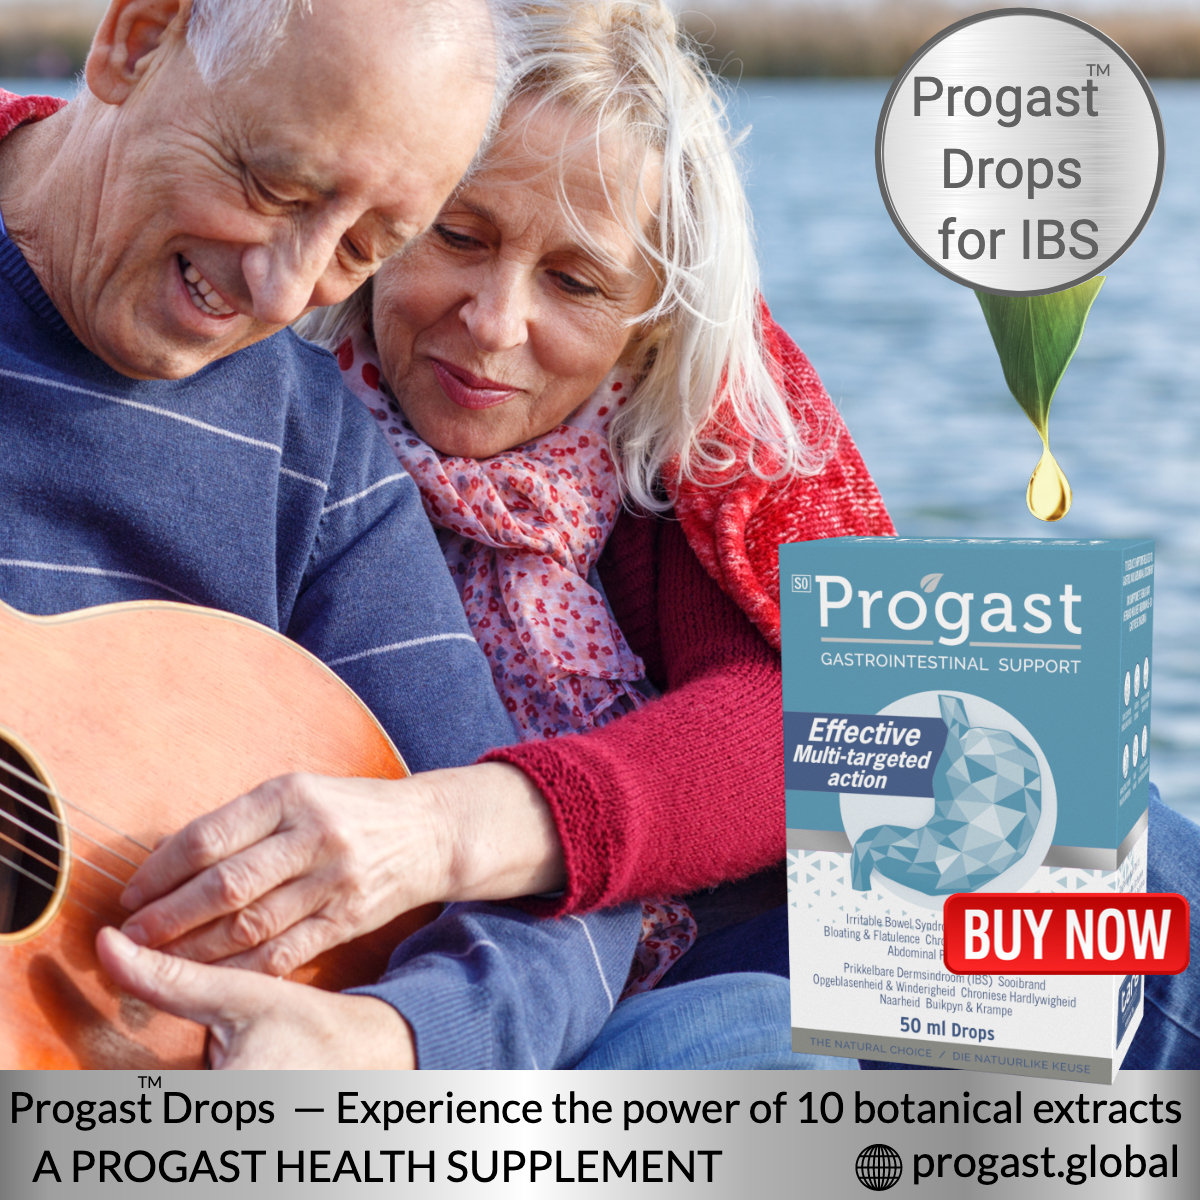 Progast Drops